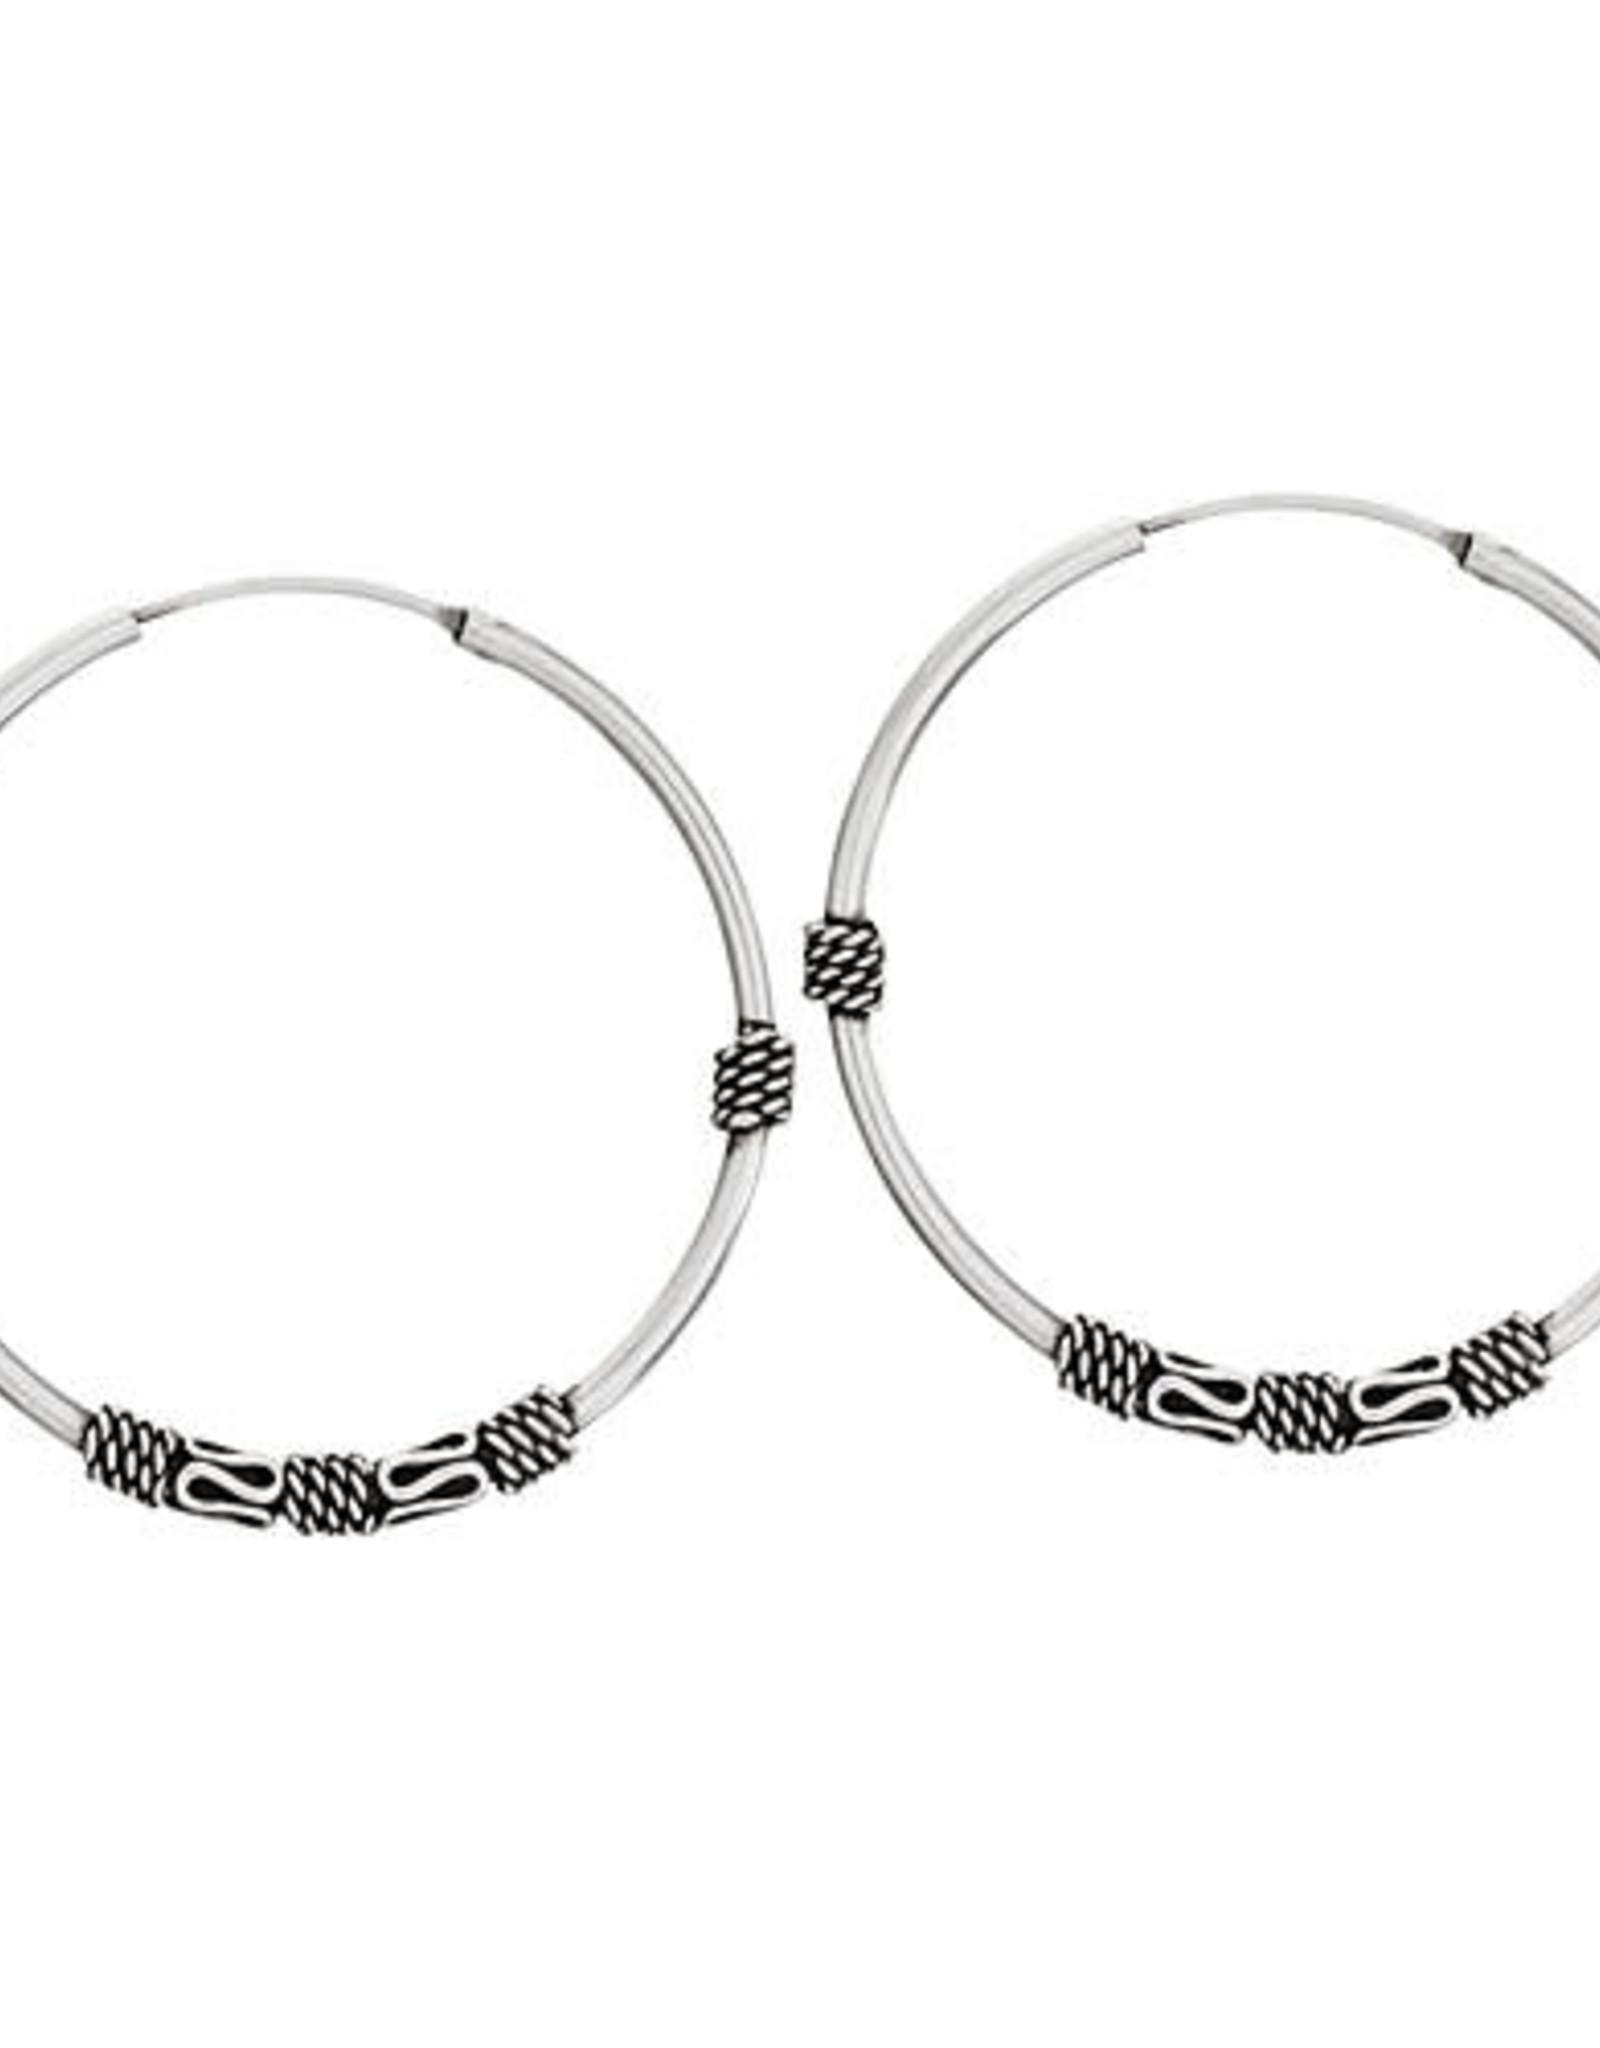 Tiger Mountain Twisted Wire Hoop Earrings